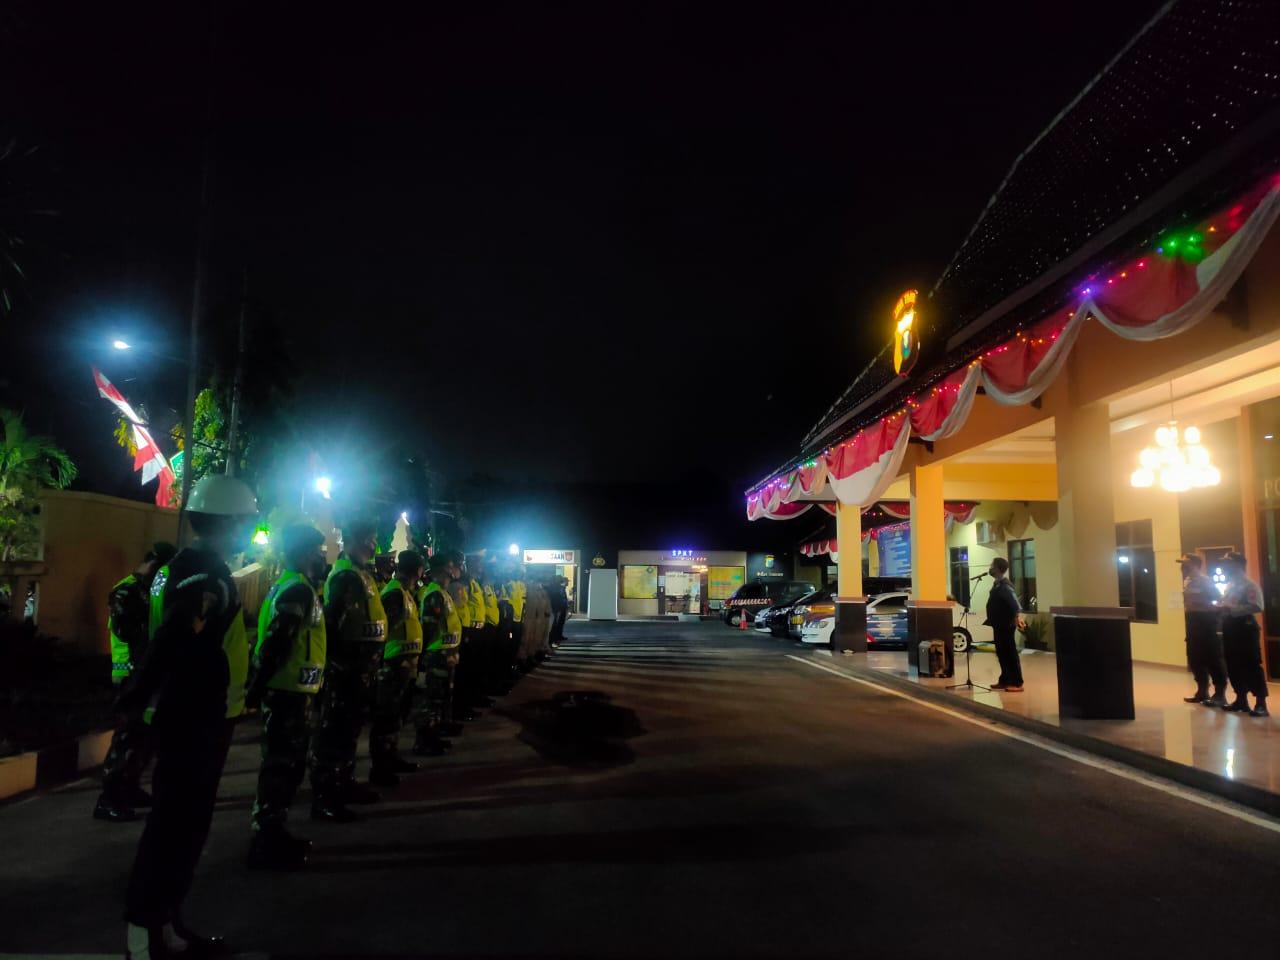 Polres Jombang Patroli Skala Besar Disiplinkan Warga Bermasker